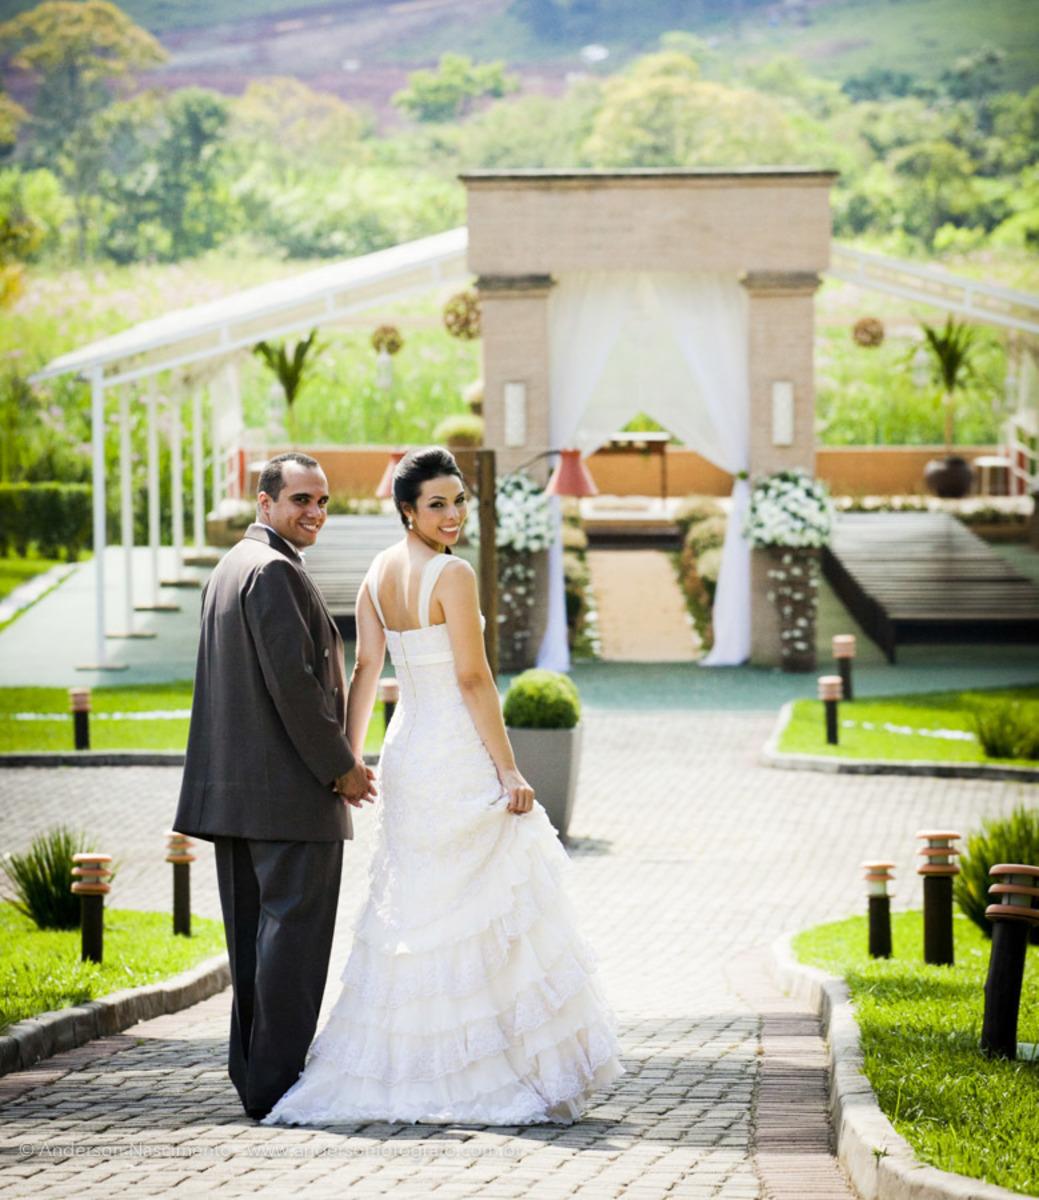 casamento-sitio-portal-da-serra-eventos-sp